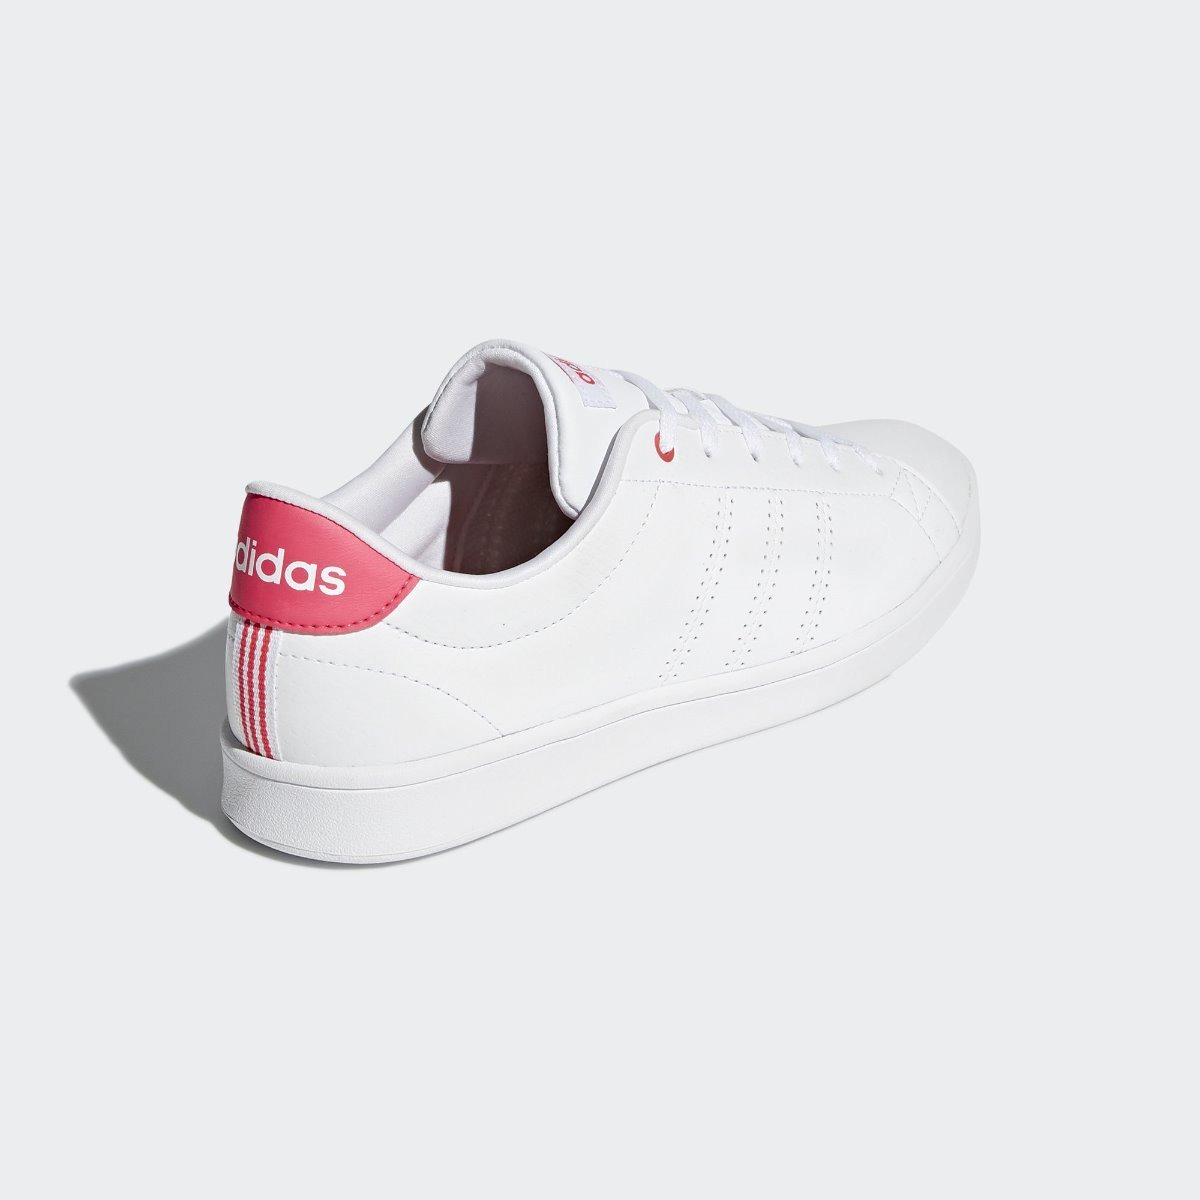 Tenis adidas Clean Qt Blancorosa Mujer Db1844 Originales